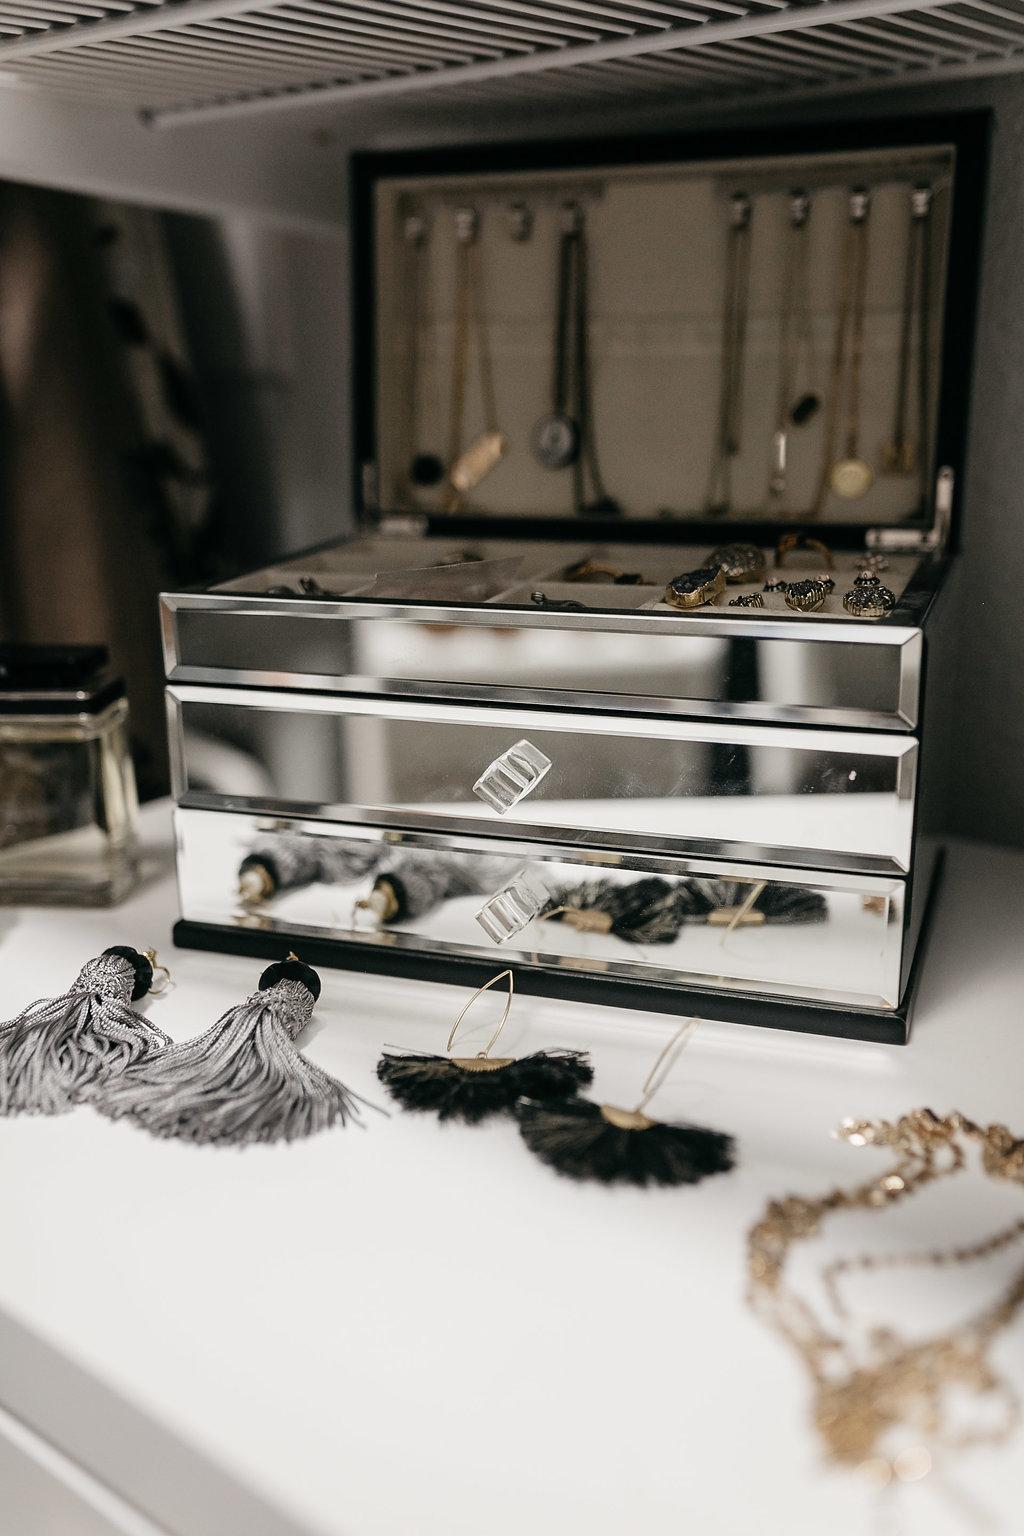 accessory box and accessories